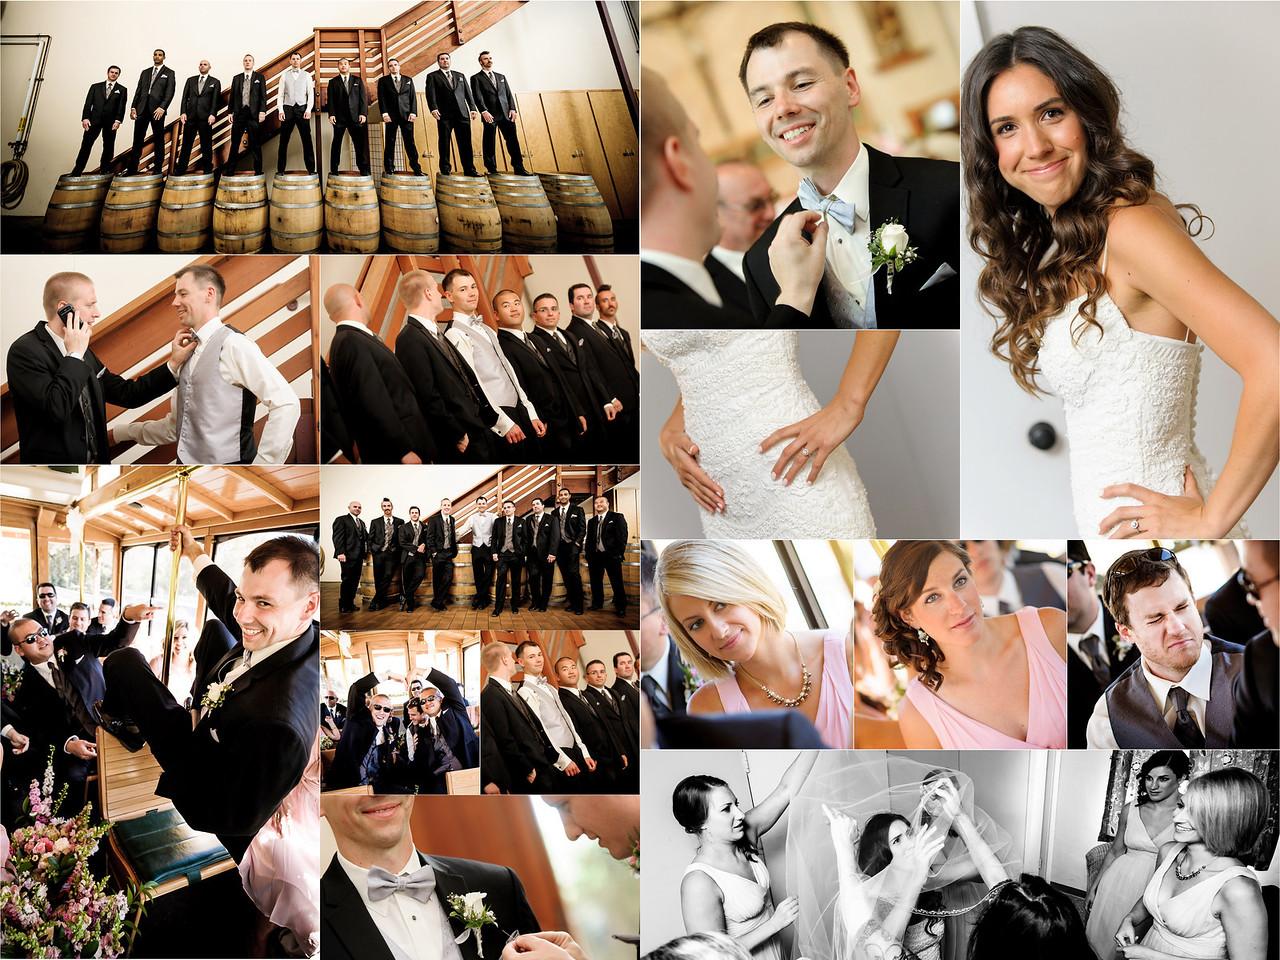 Jenny_and_Dimitriy_Wedding_Photography_4x6_Photo_Board_02